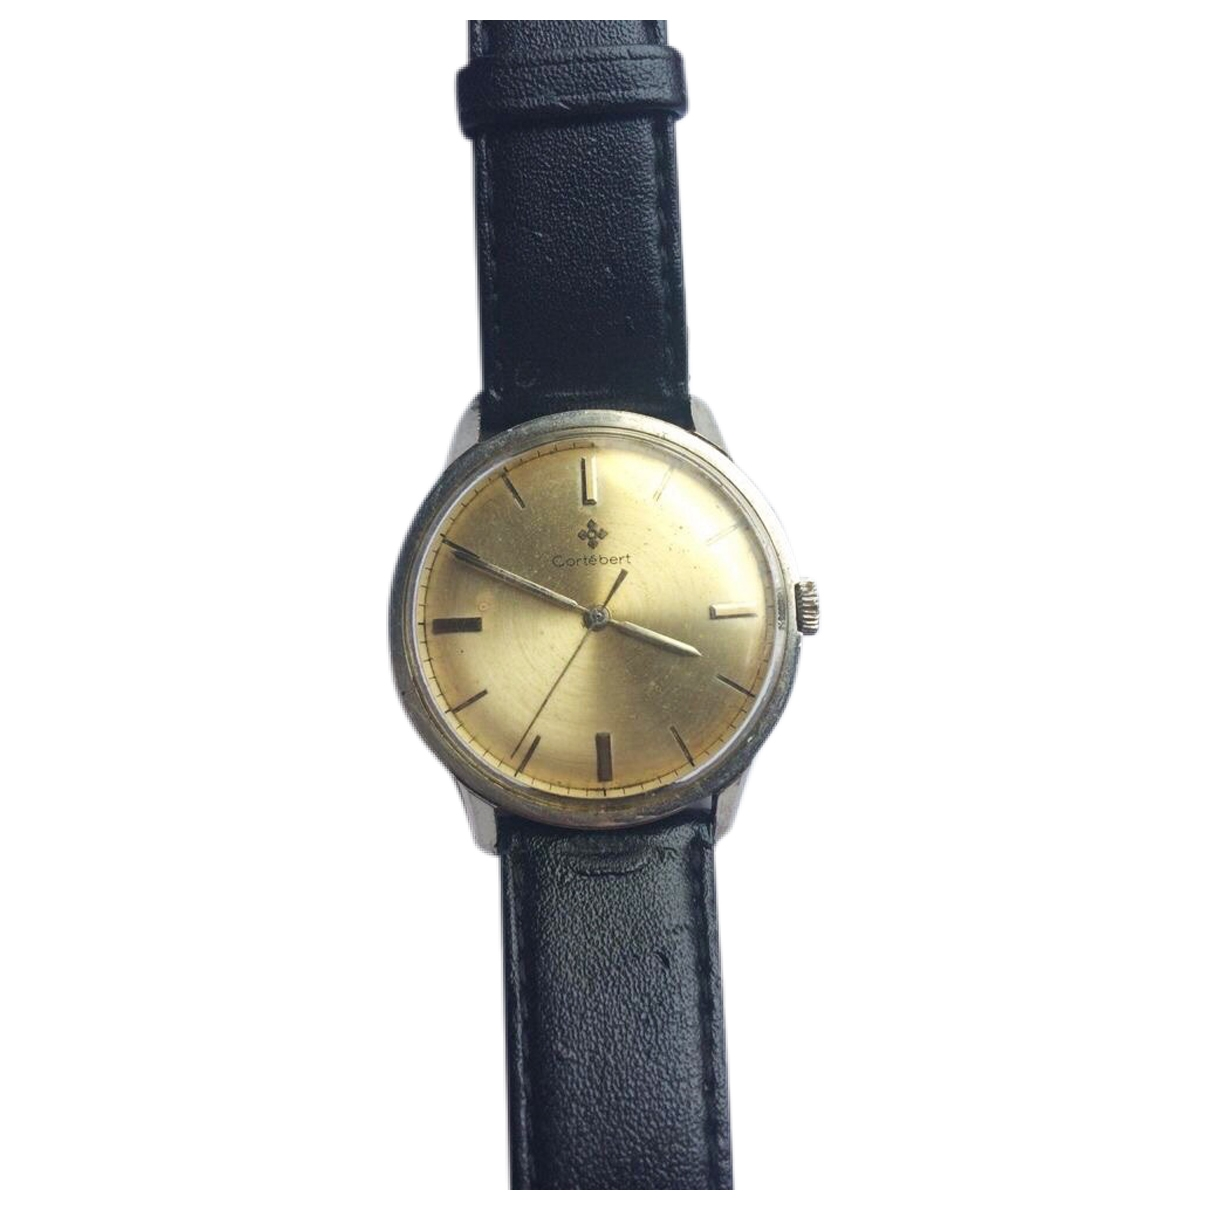 Relojes Cortebert